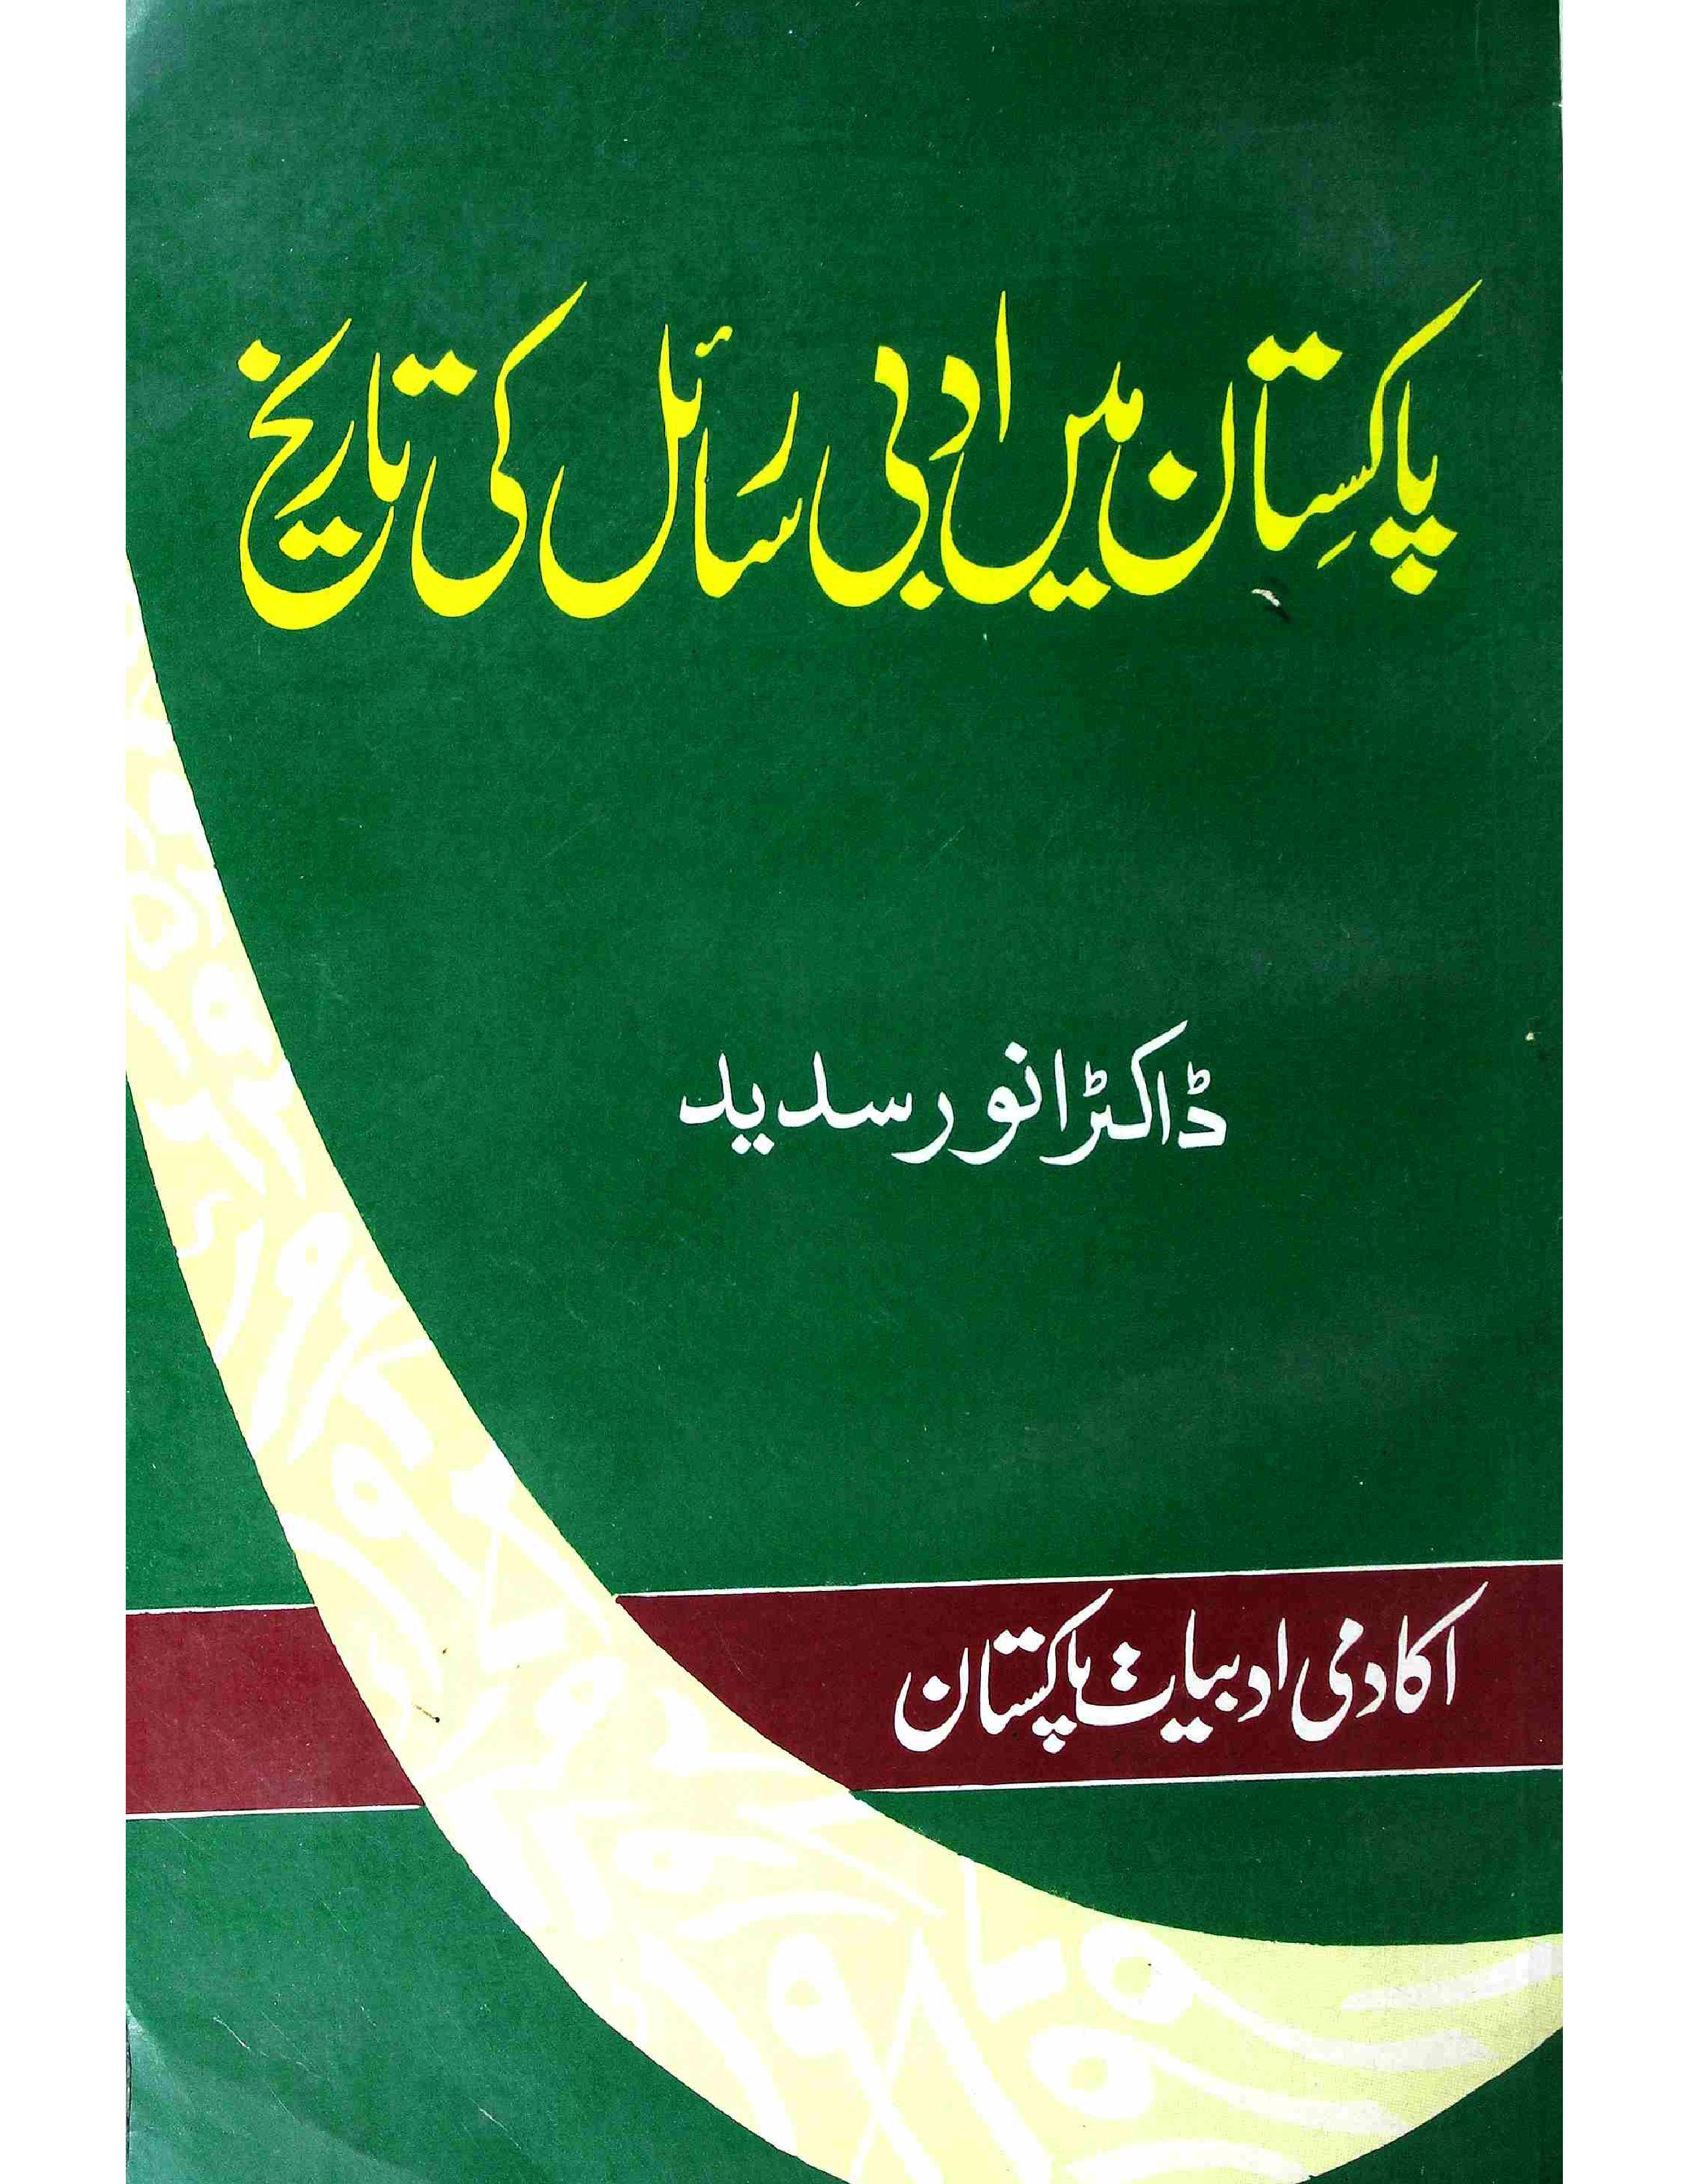 Pakistan Mein Adabi Rasael Ki Tarikh